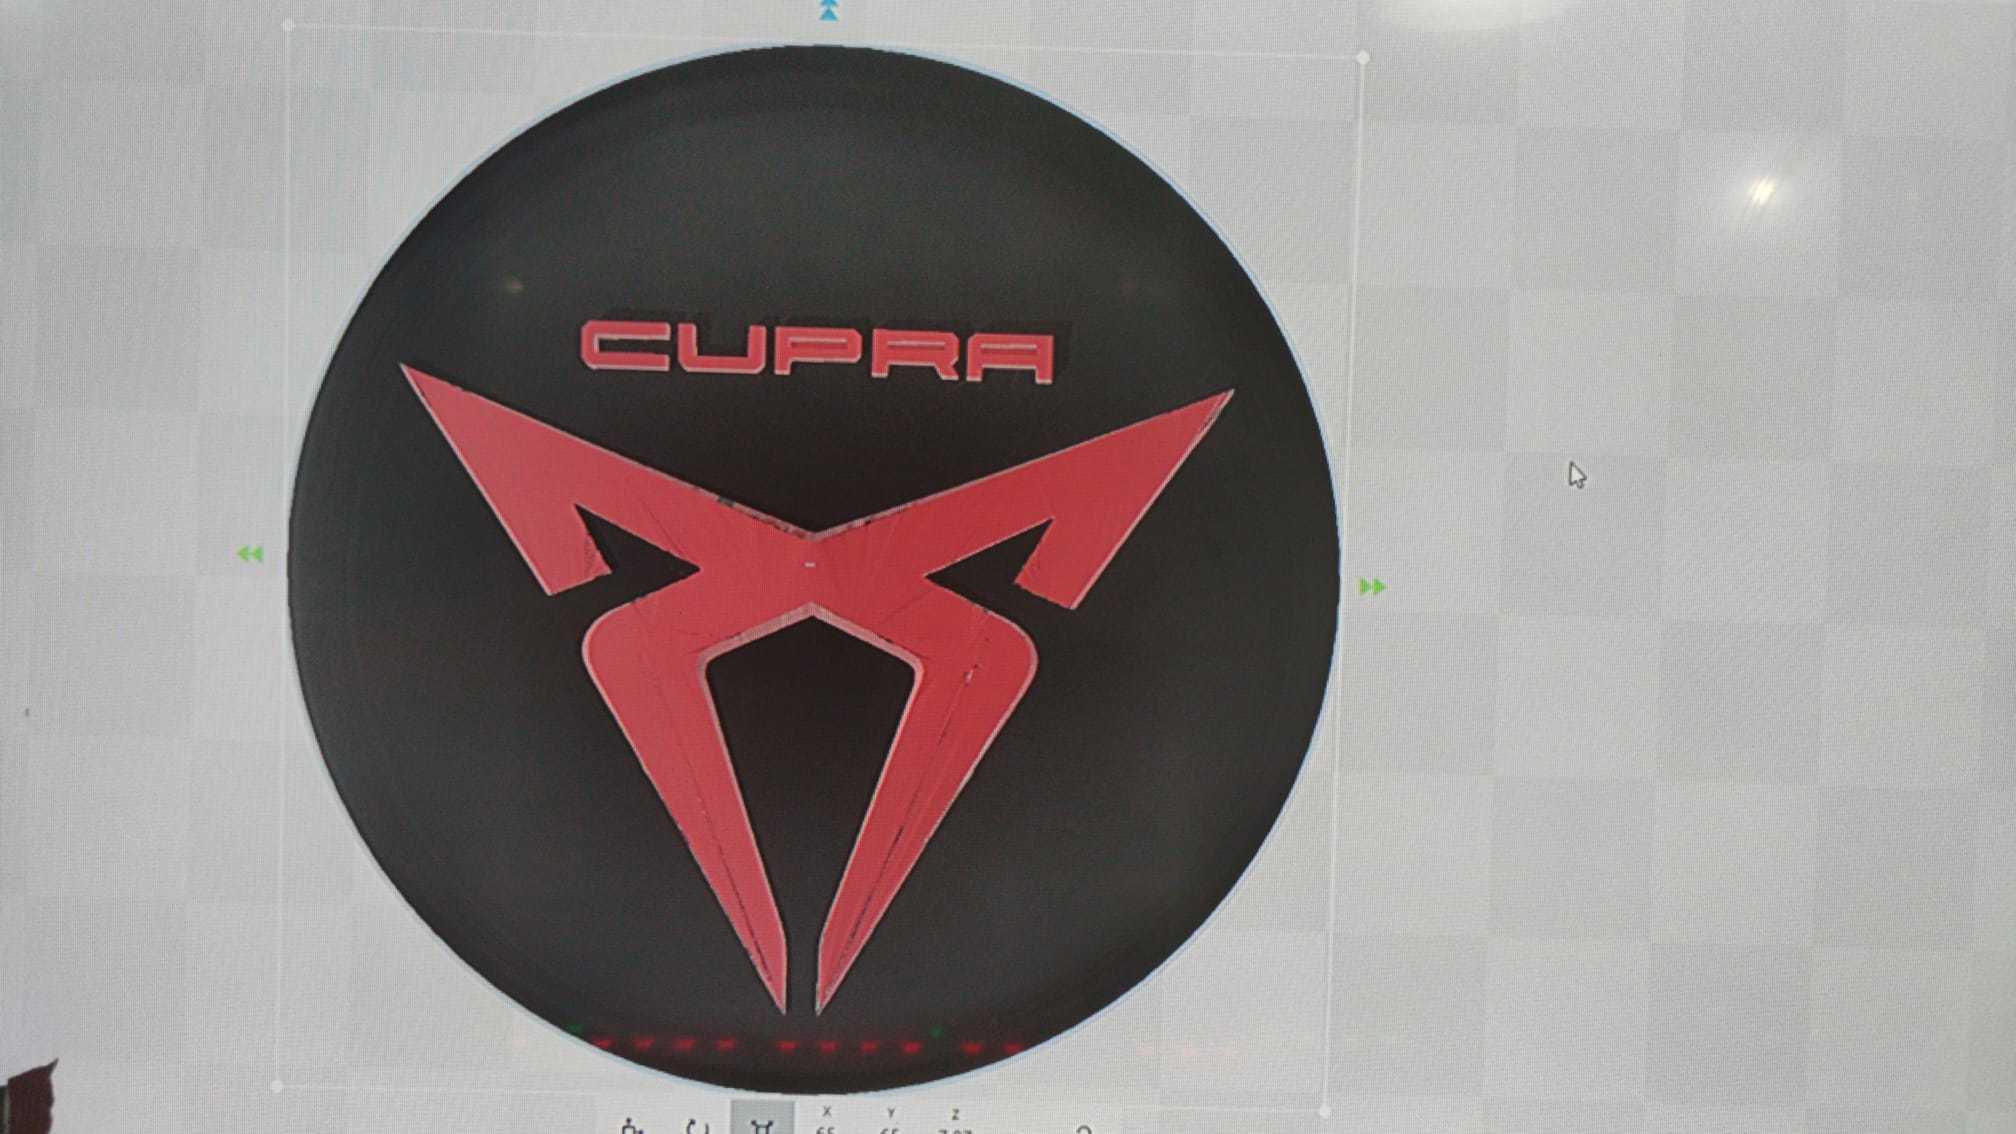 IMG-20200706-WA0139.jpg Download free OBJ file flying cupra logo • 3D print design, flakitasinsaber